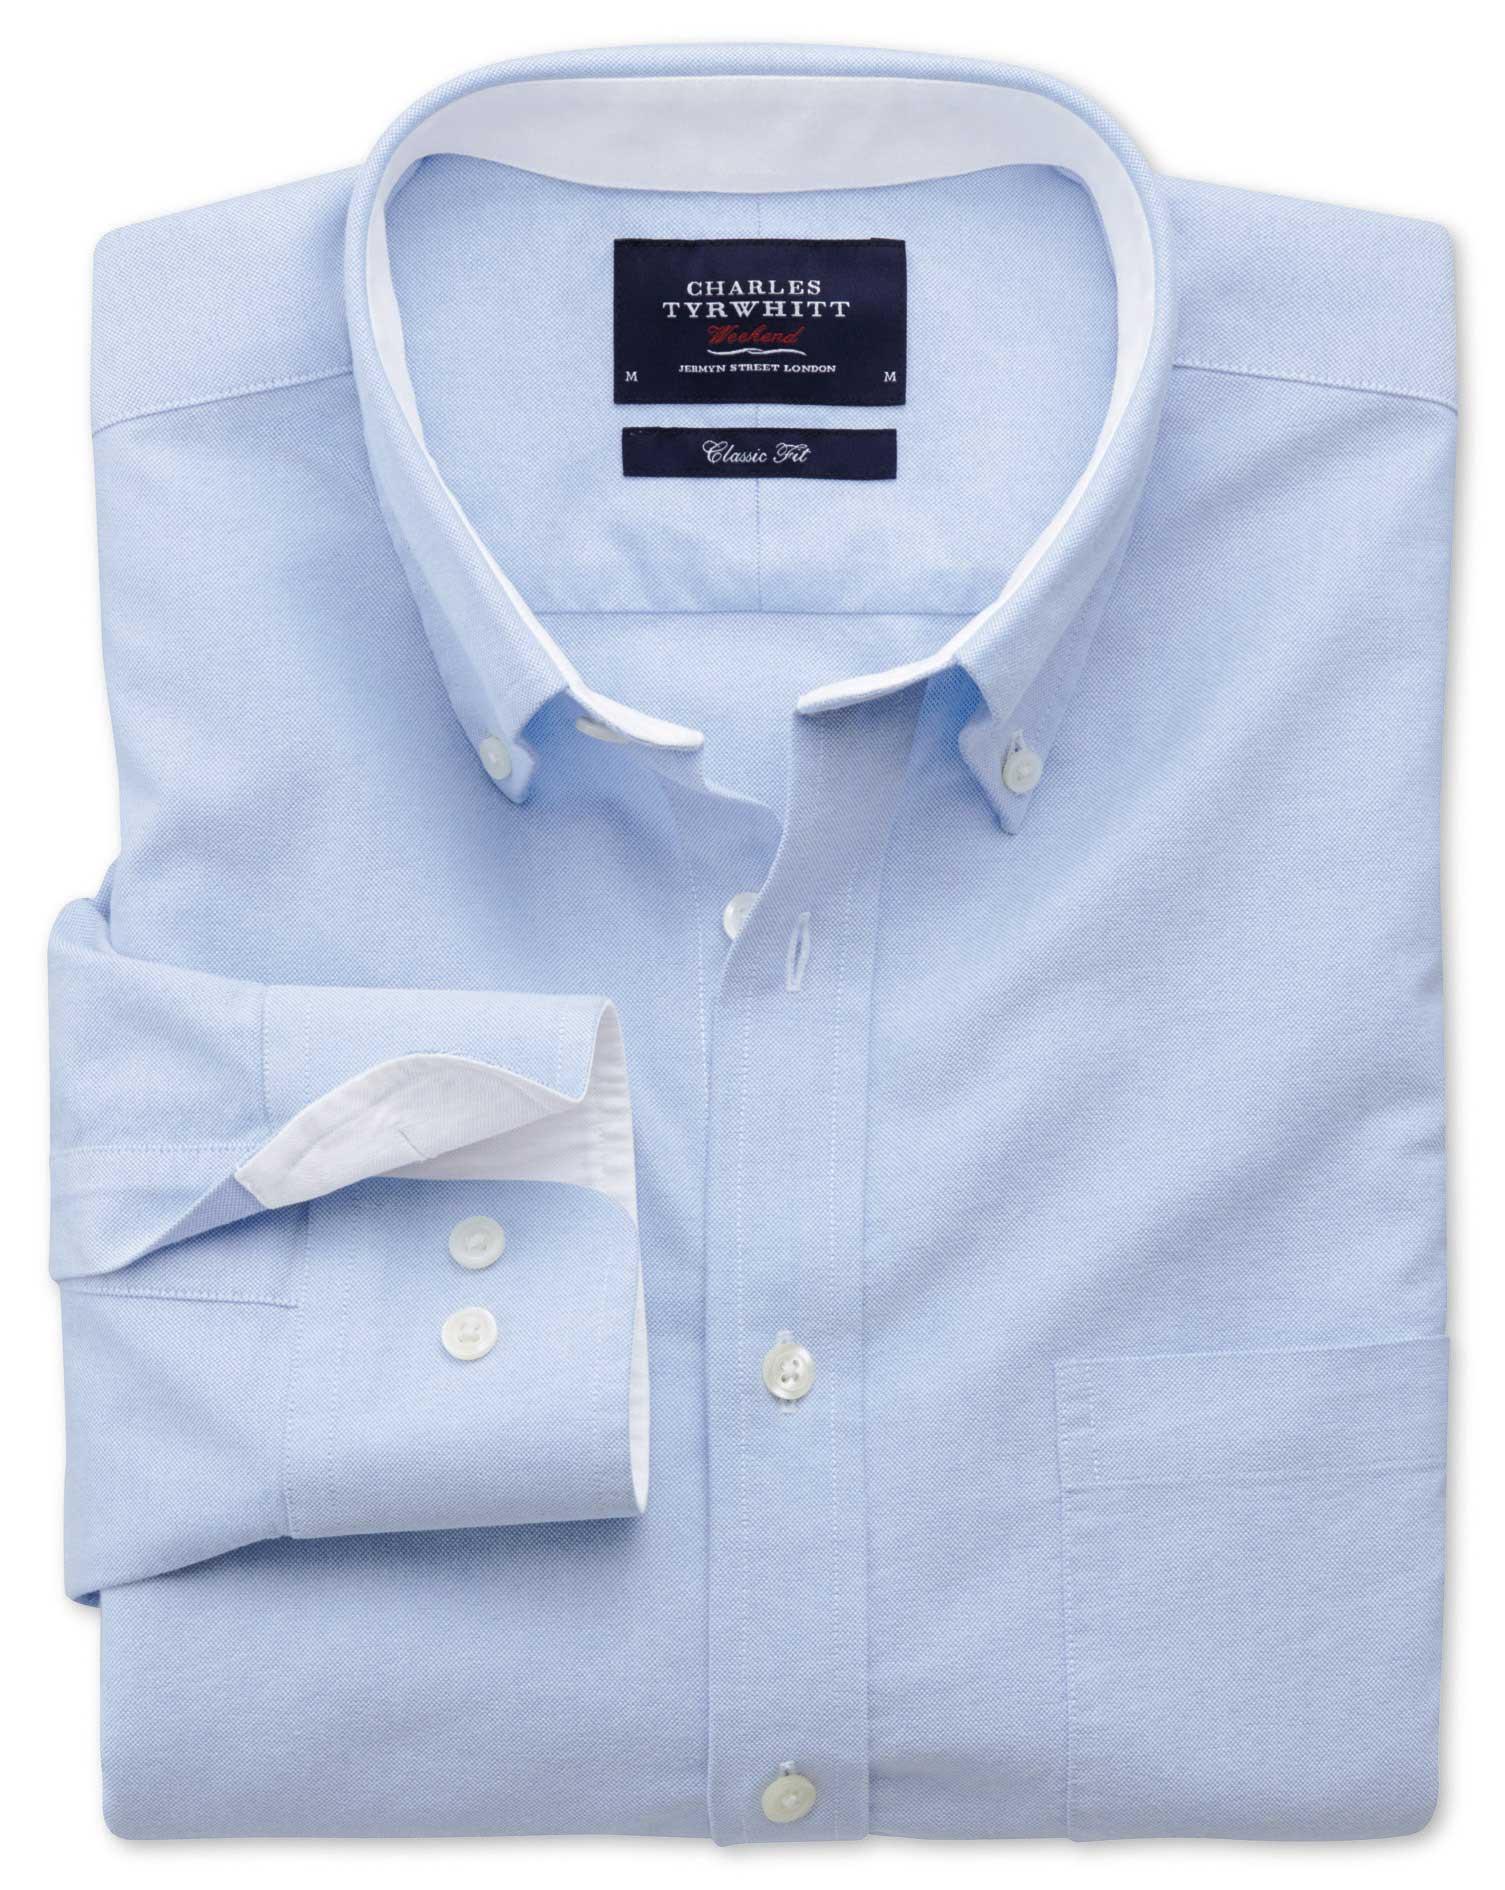 Slim Fit Sky Blue Washed Oxford Cotton Shirt Single Cuff Size XXL by Charles Tyrwhitt